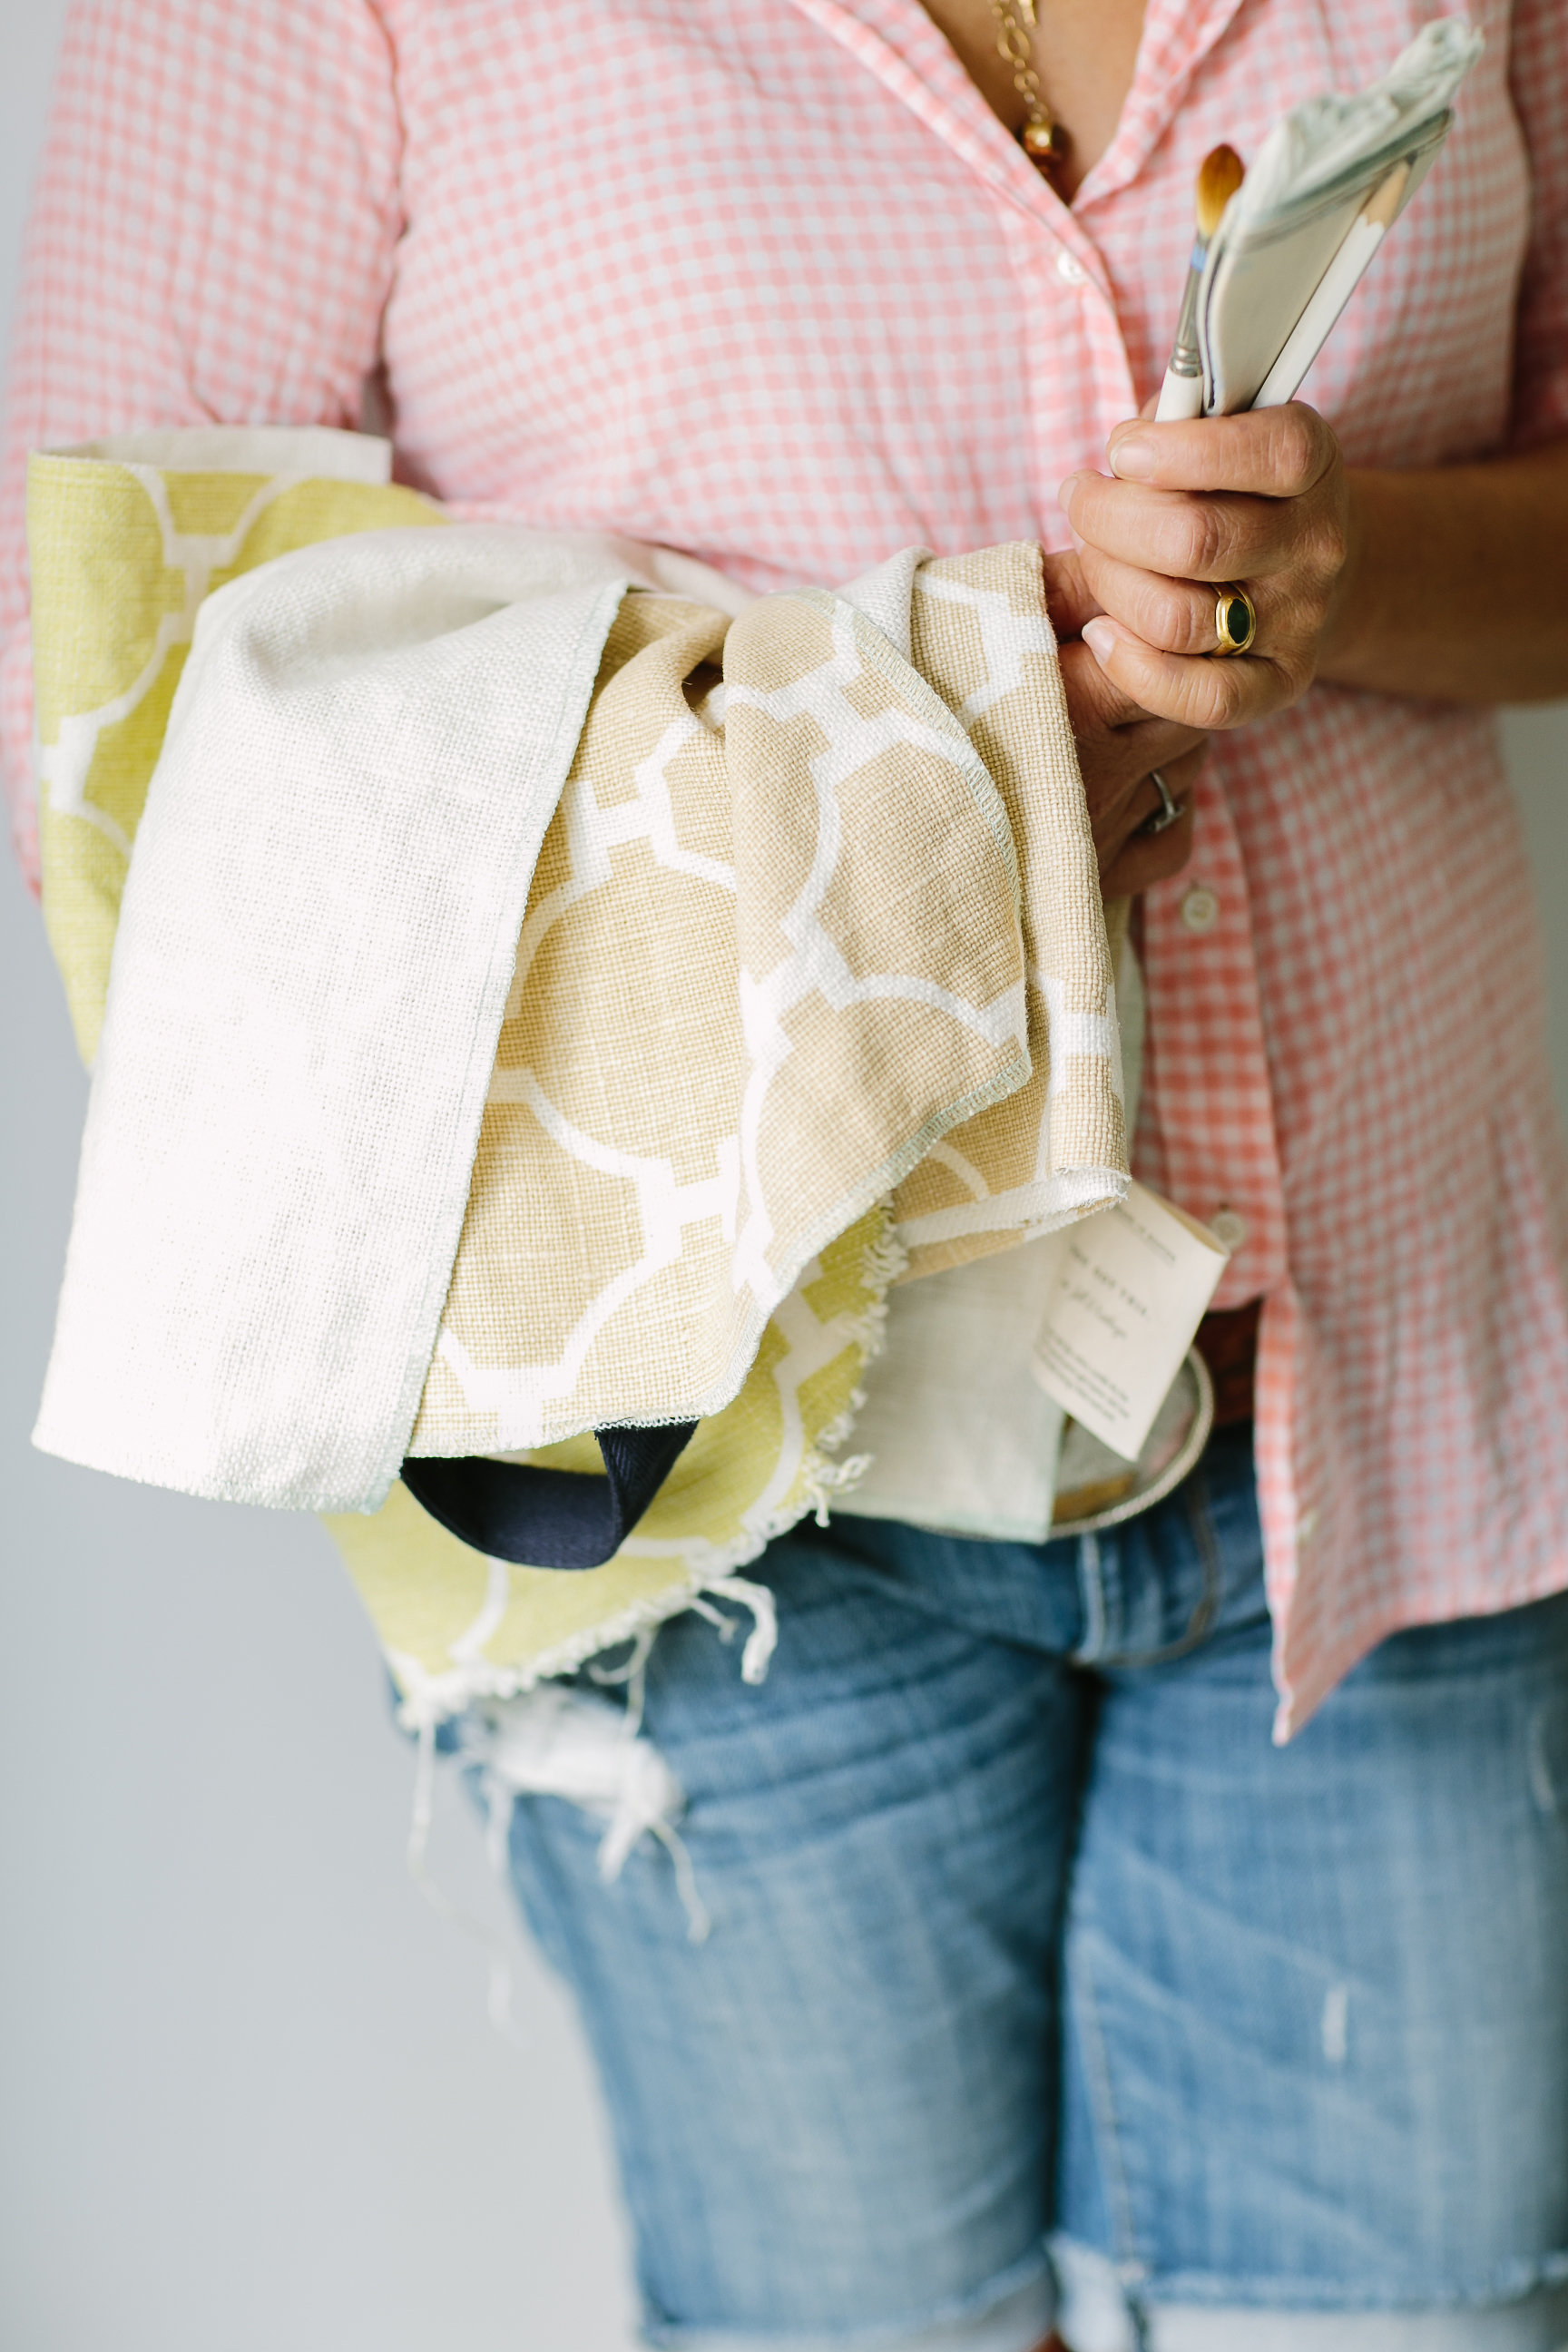 jill-rosenwald-kathryn-yee-boston-makers-towel-everyday-co